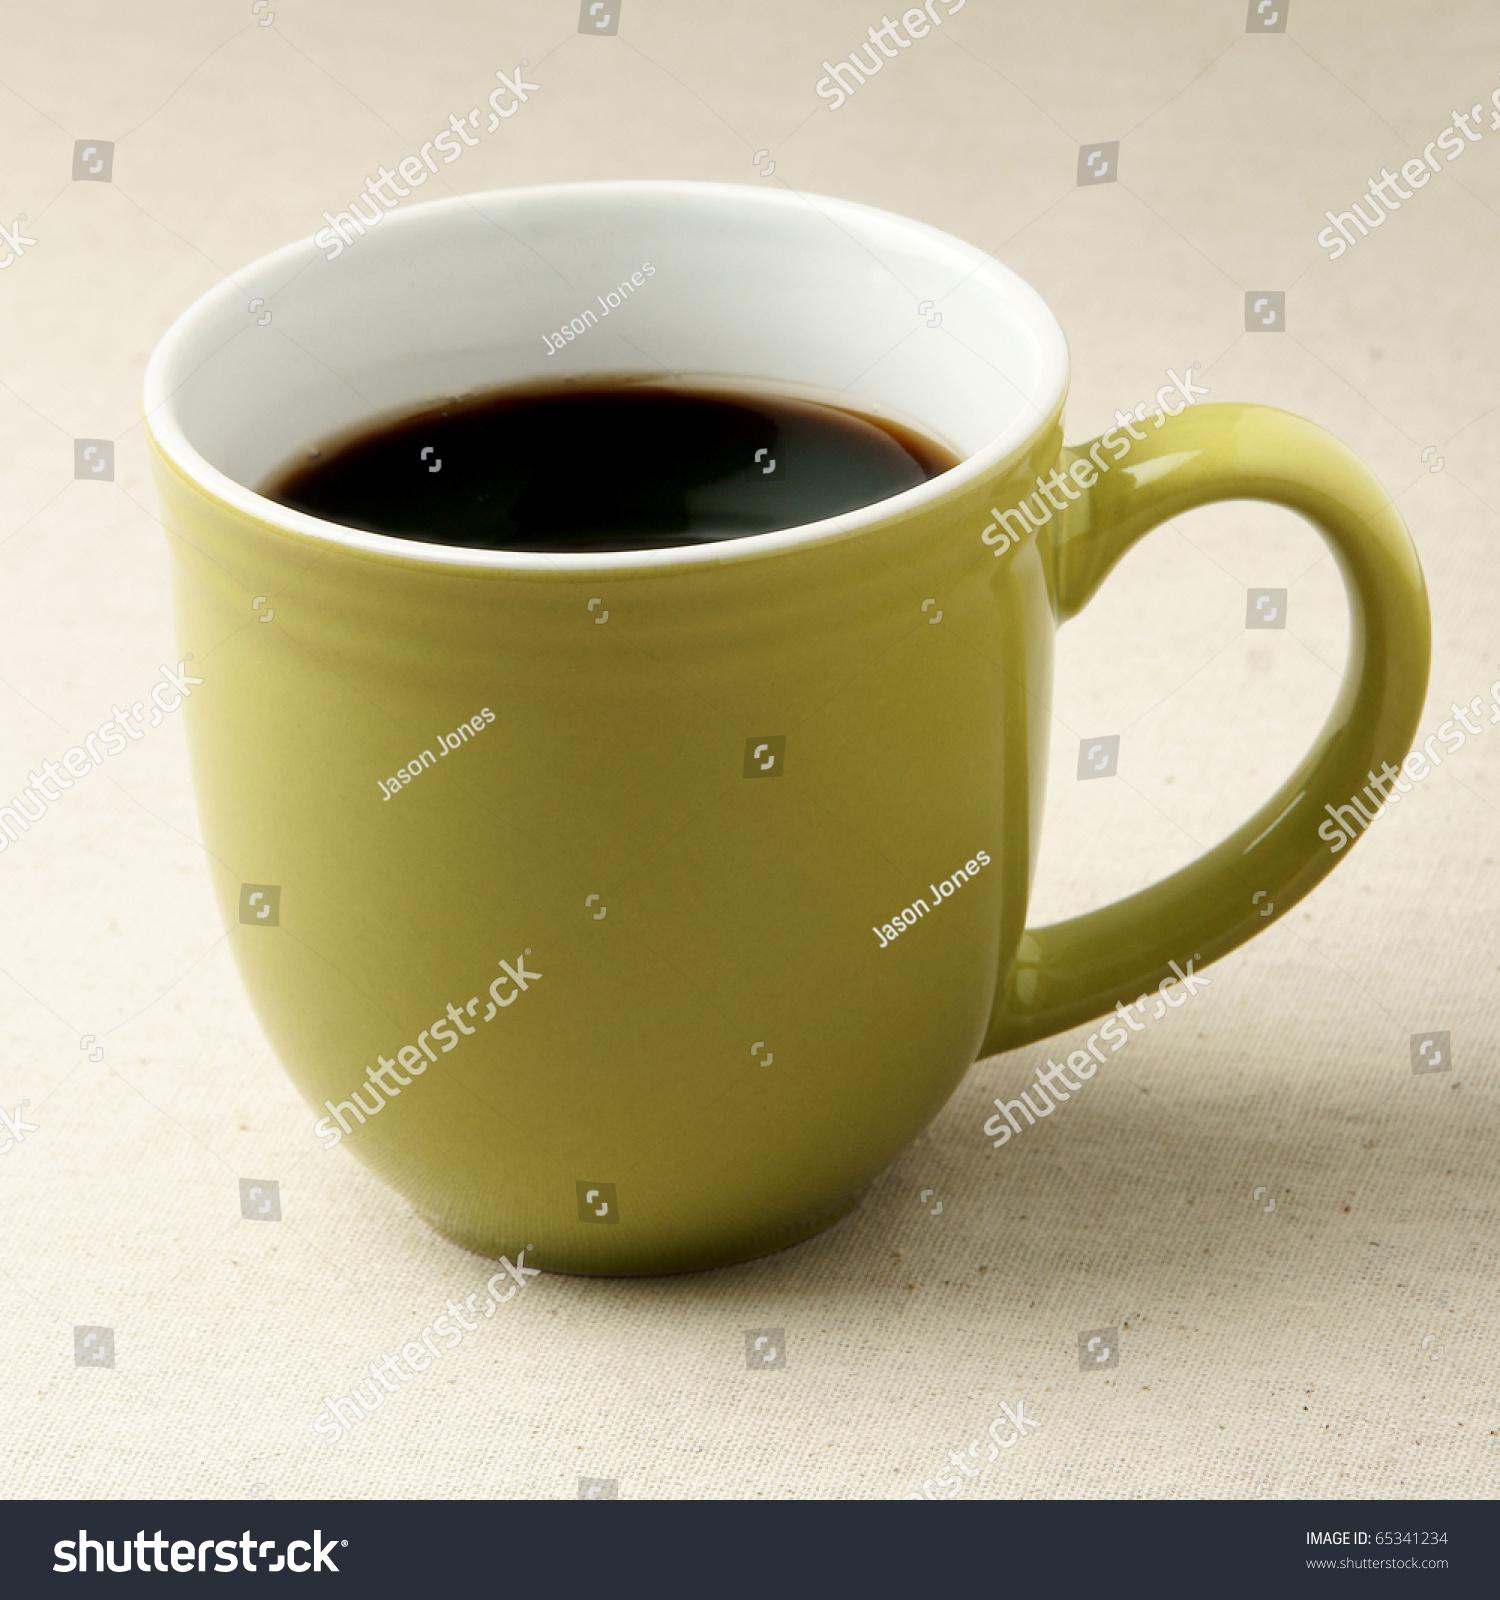 Green Coffee Mug On Rustic Table Cloth Stock Photo